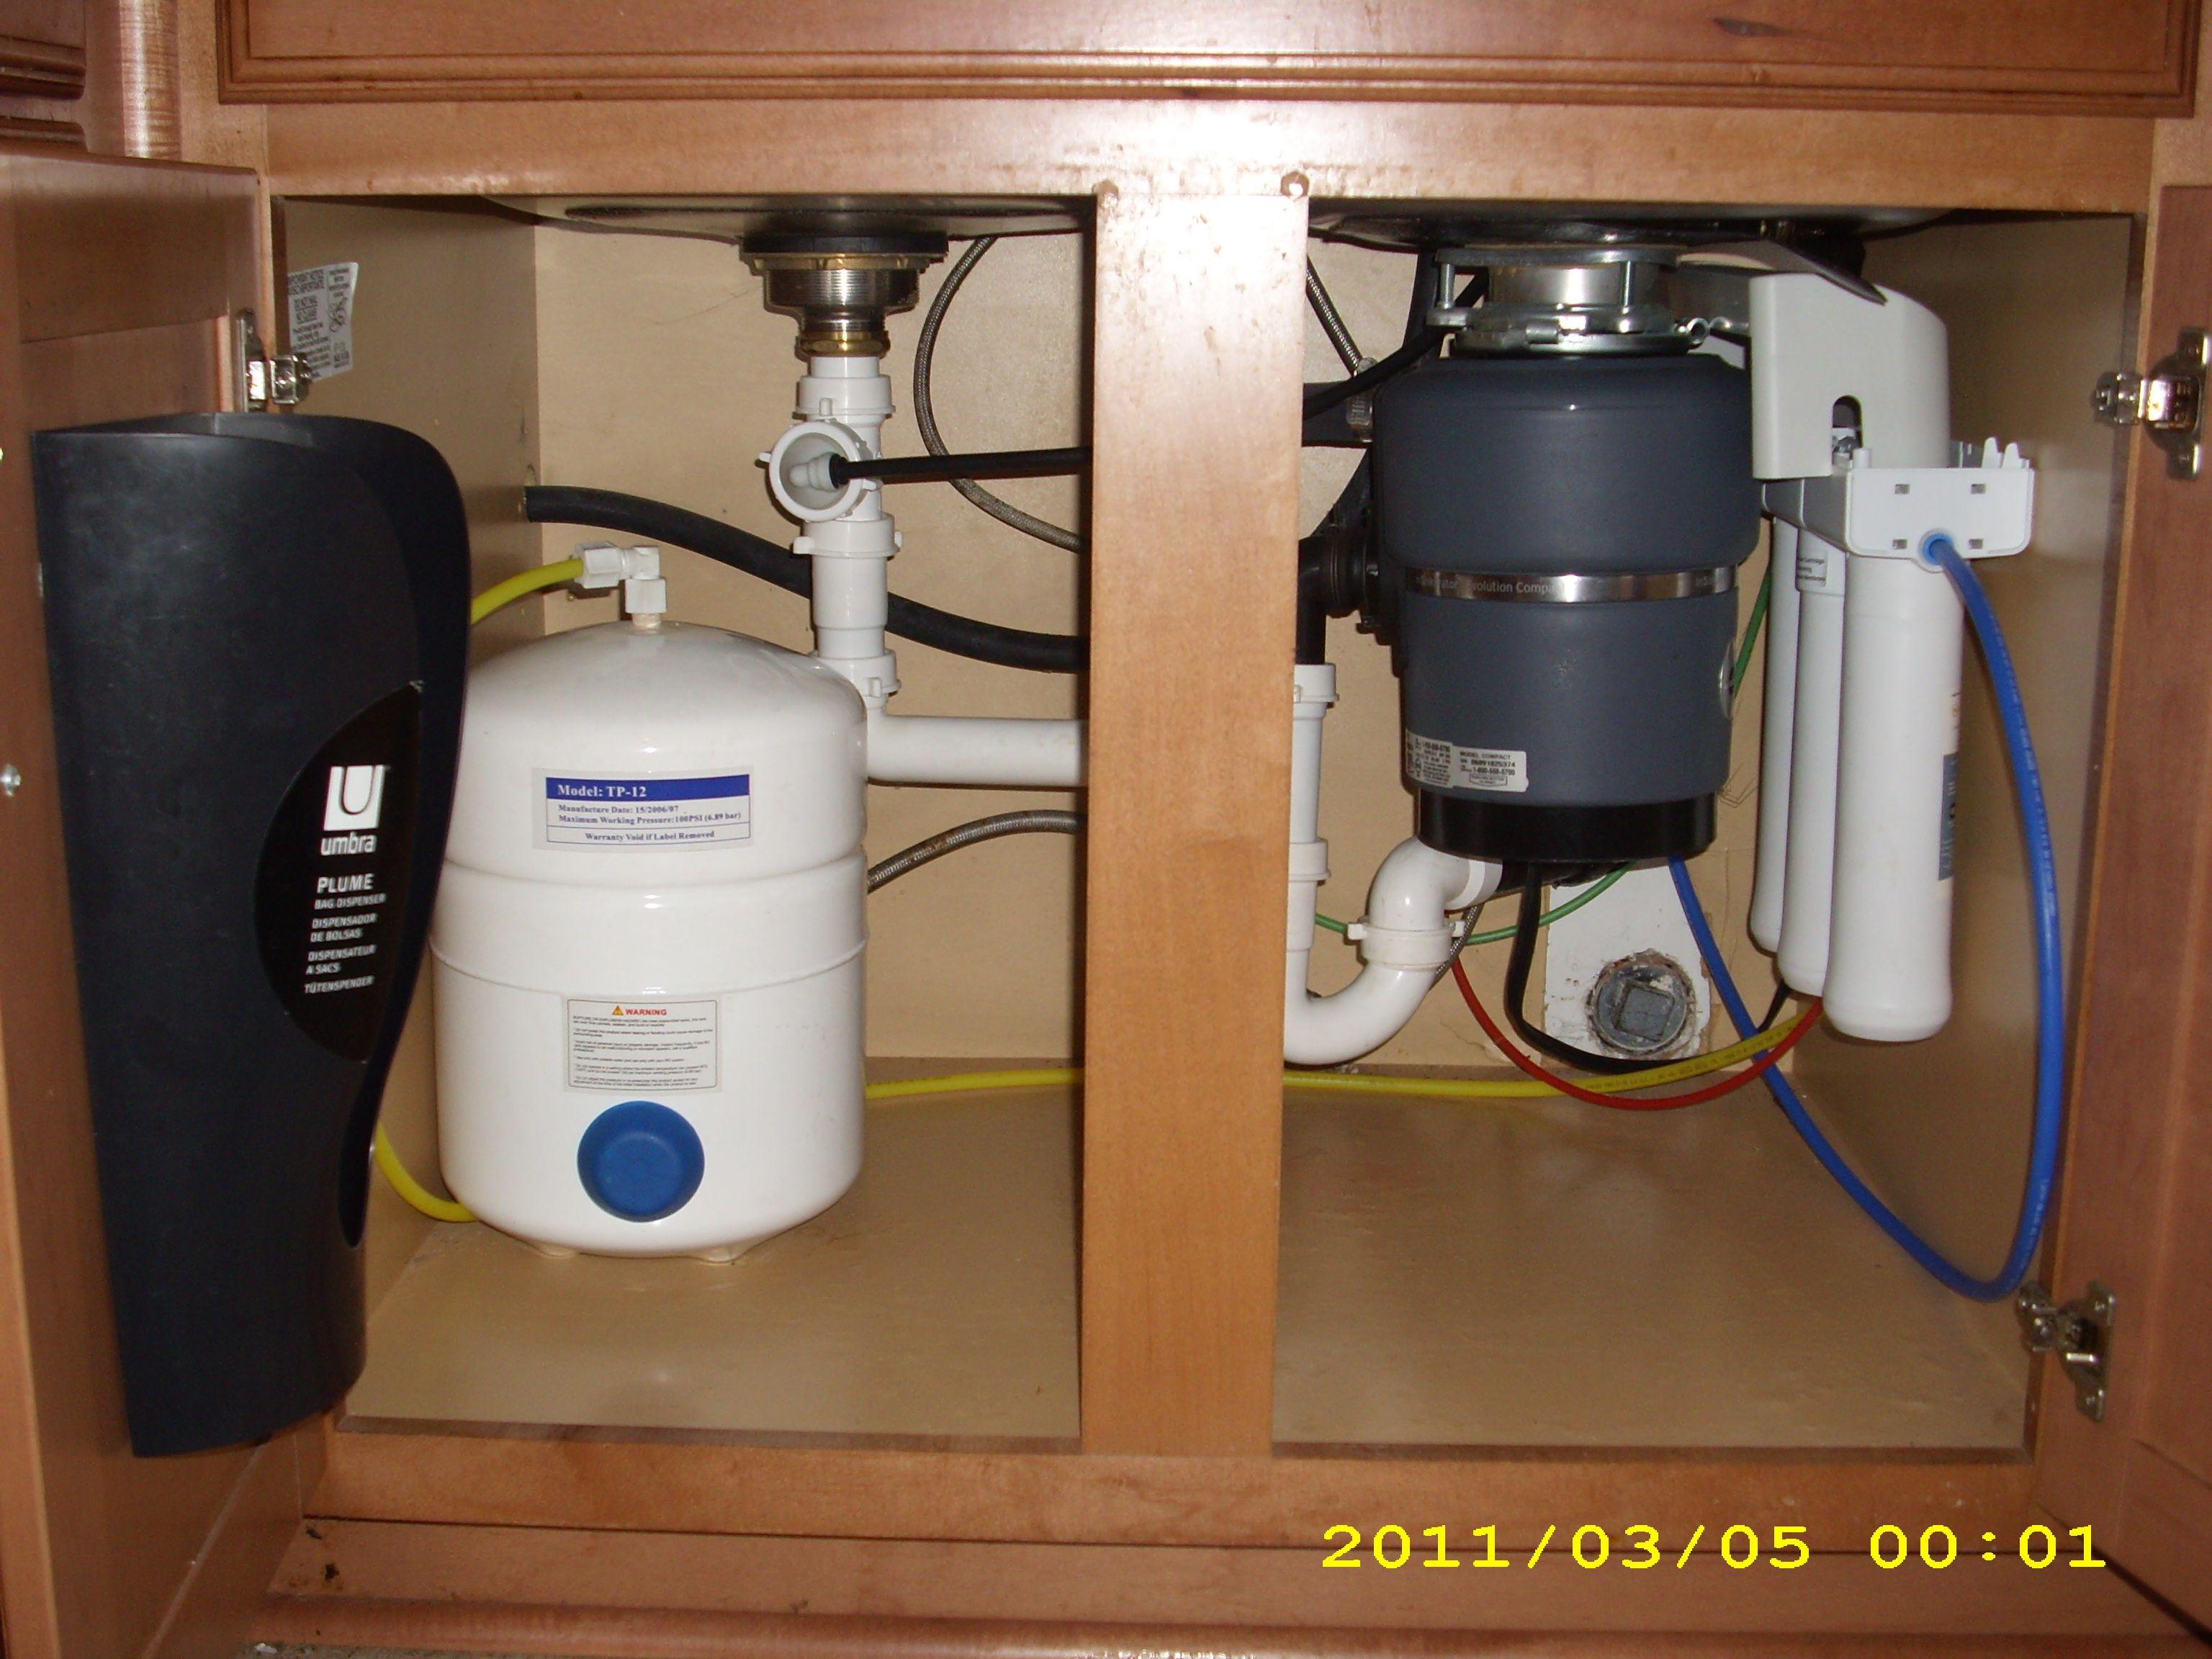 Kitchen drain lines replaced. in 2020 Plumbing repair